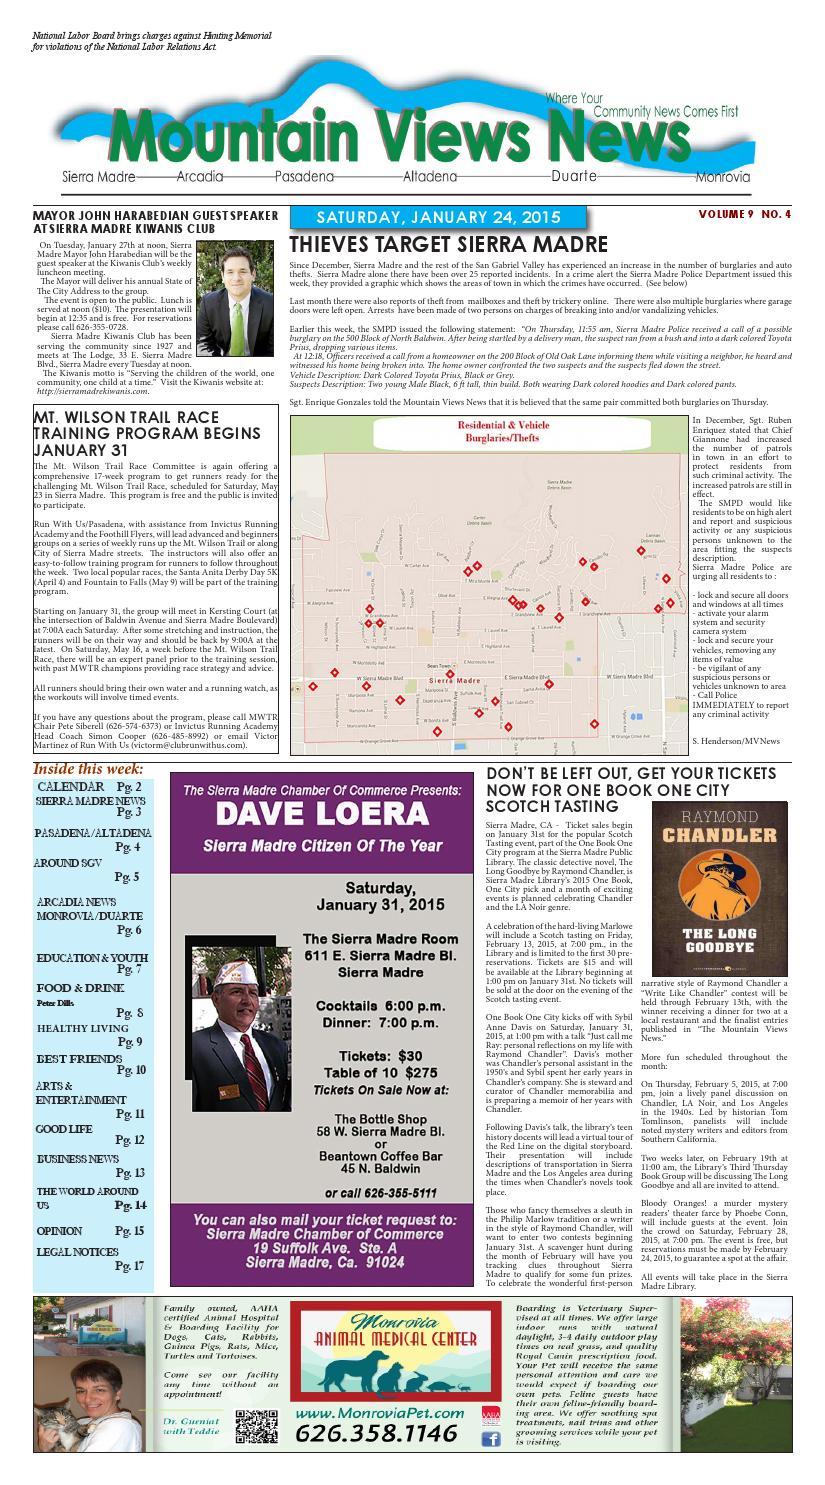 Mvnews 2015 01 24 by Mountain Views News - issuu